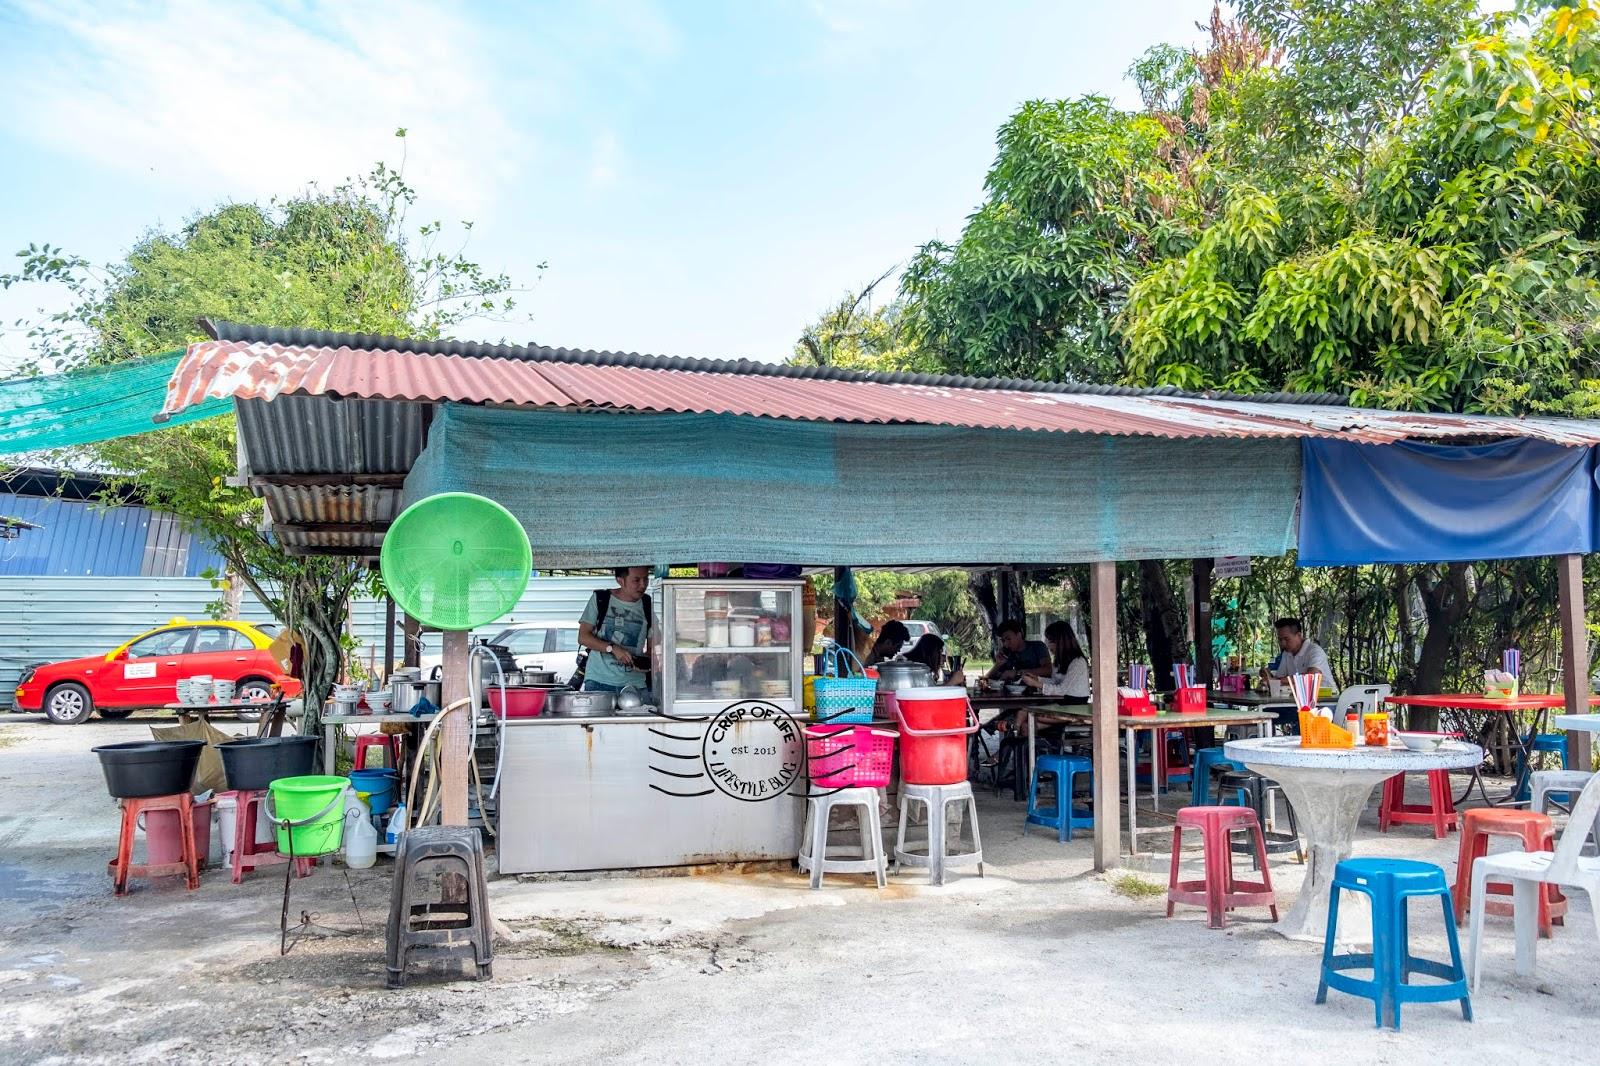 Lemon Koay Teow Soup at Bagan Lallang, Butterworth, Penang